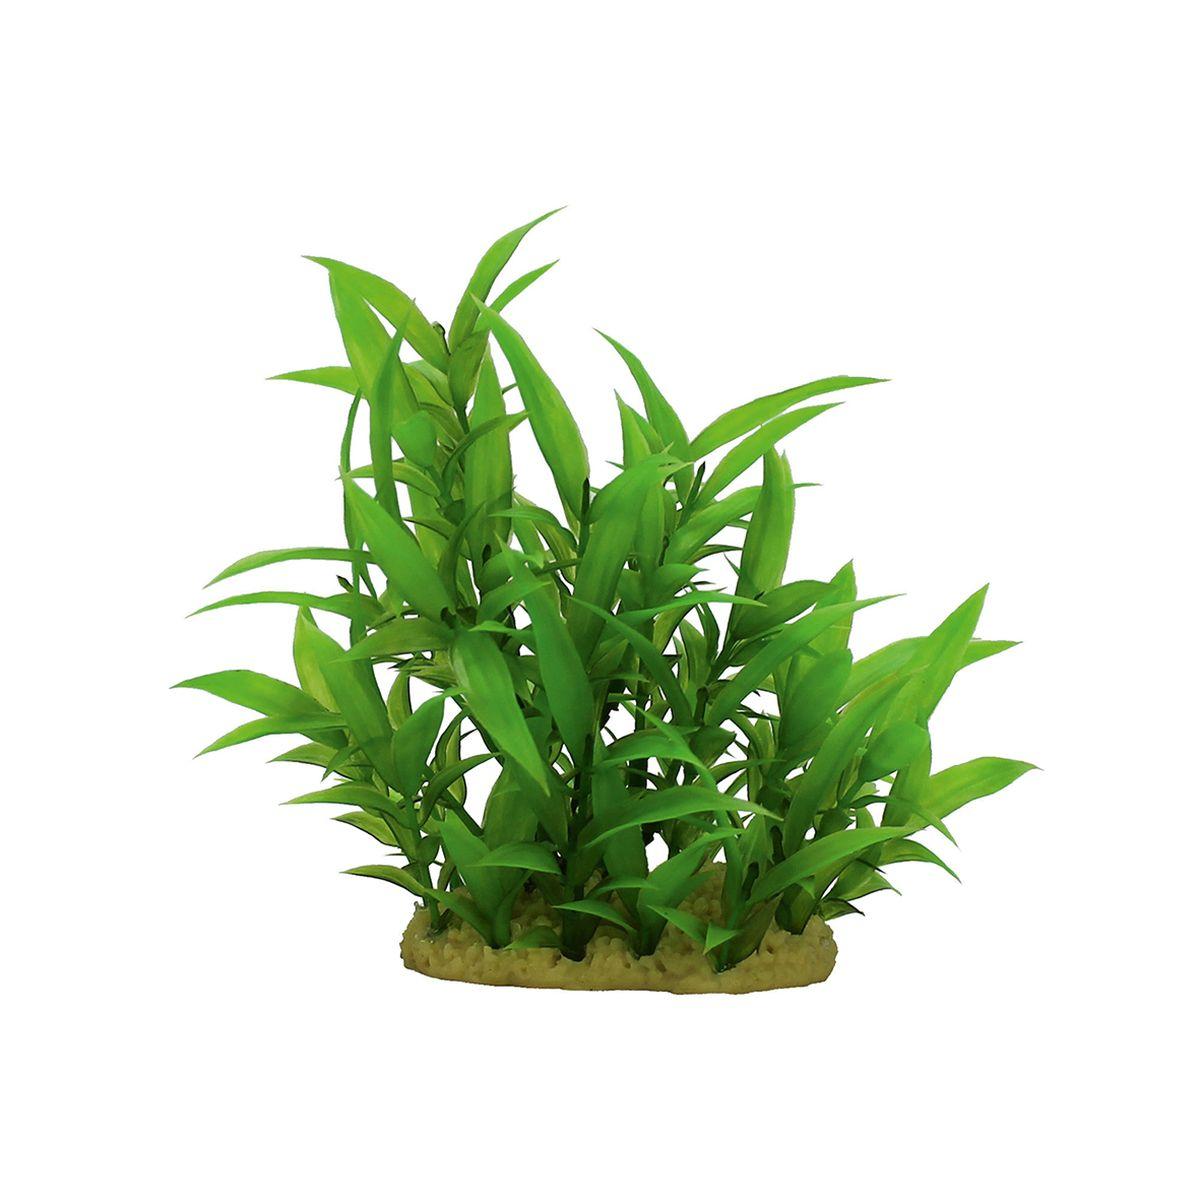 Растение для аквариума ArtUniq Гигрофила сиамская, высота 15 см0120710Растение для аквариума ArtUniq Гигрофила сиамская, высота 15 см